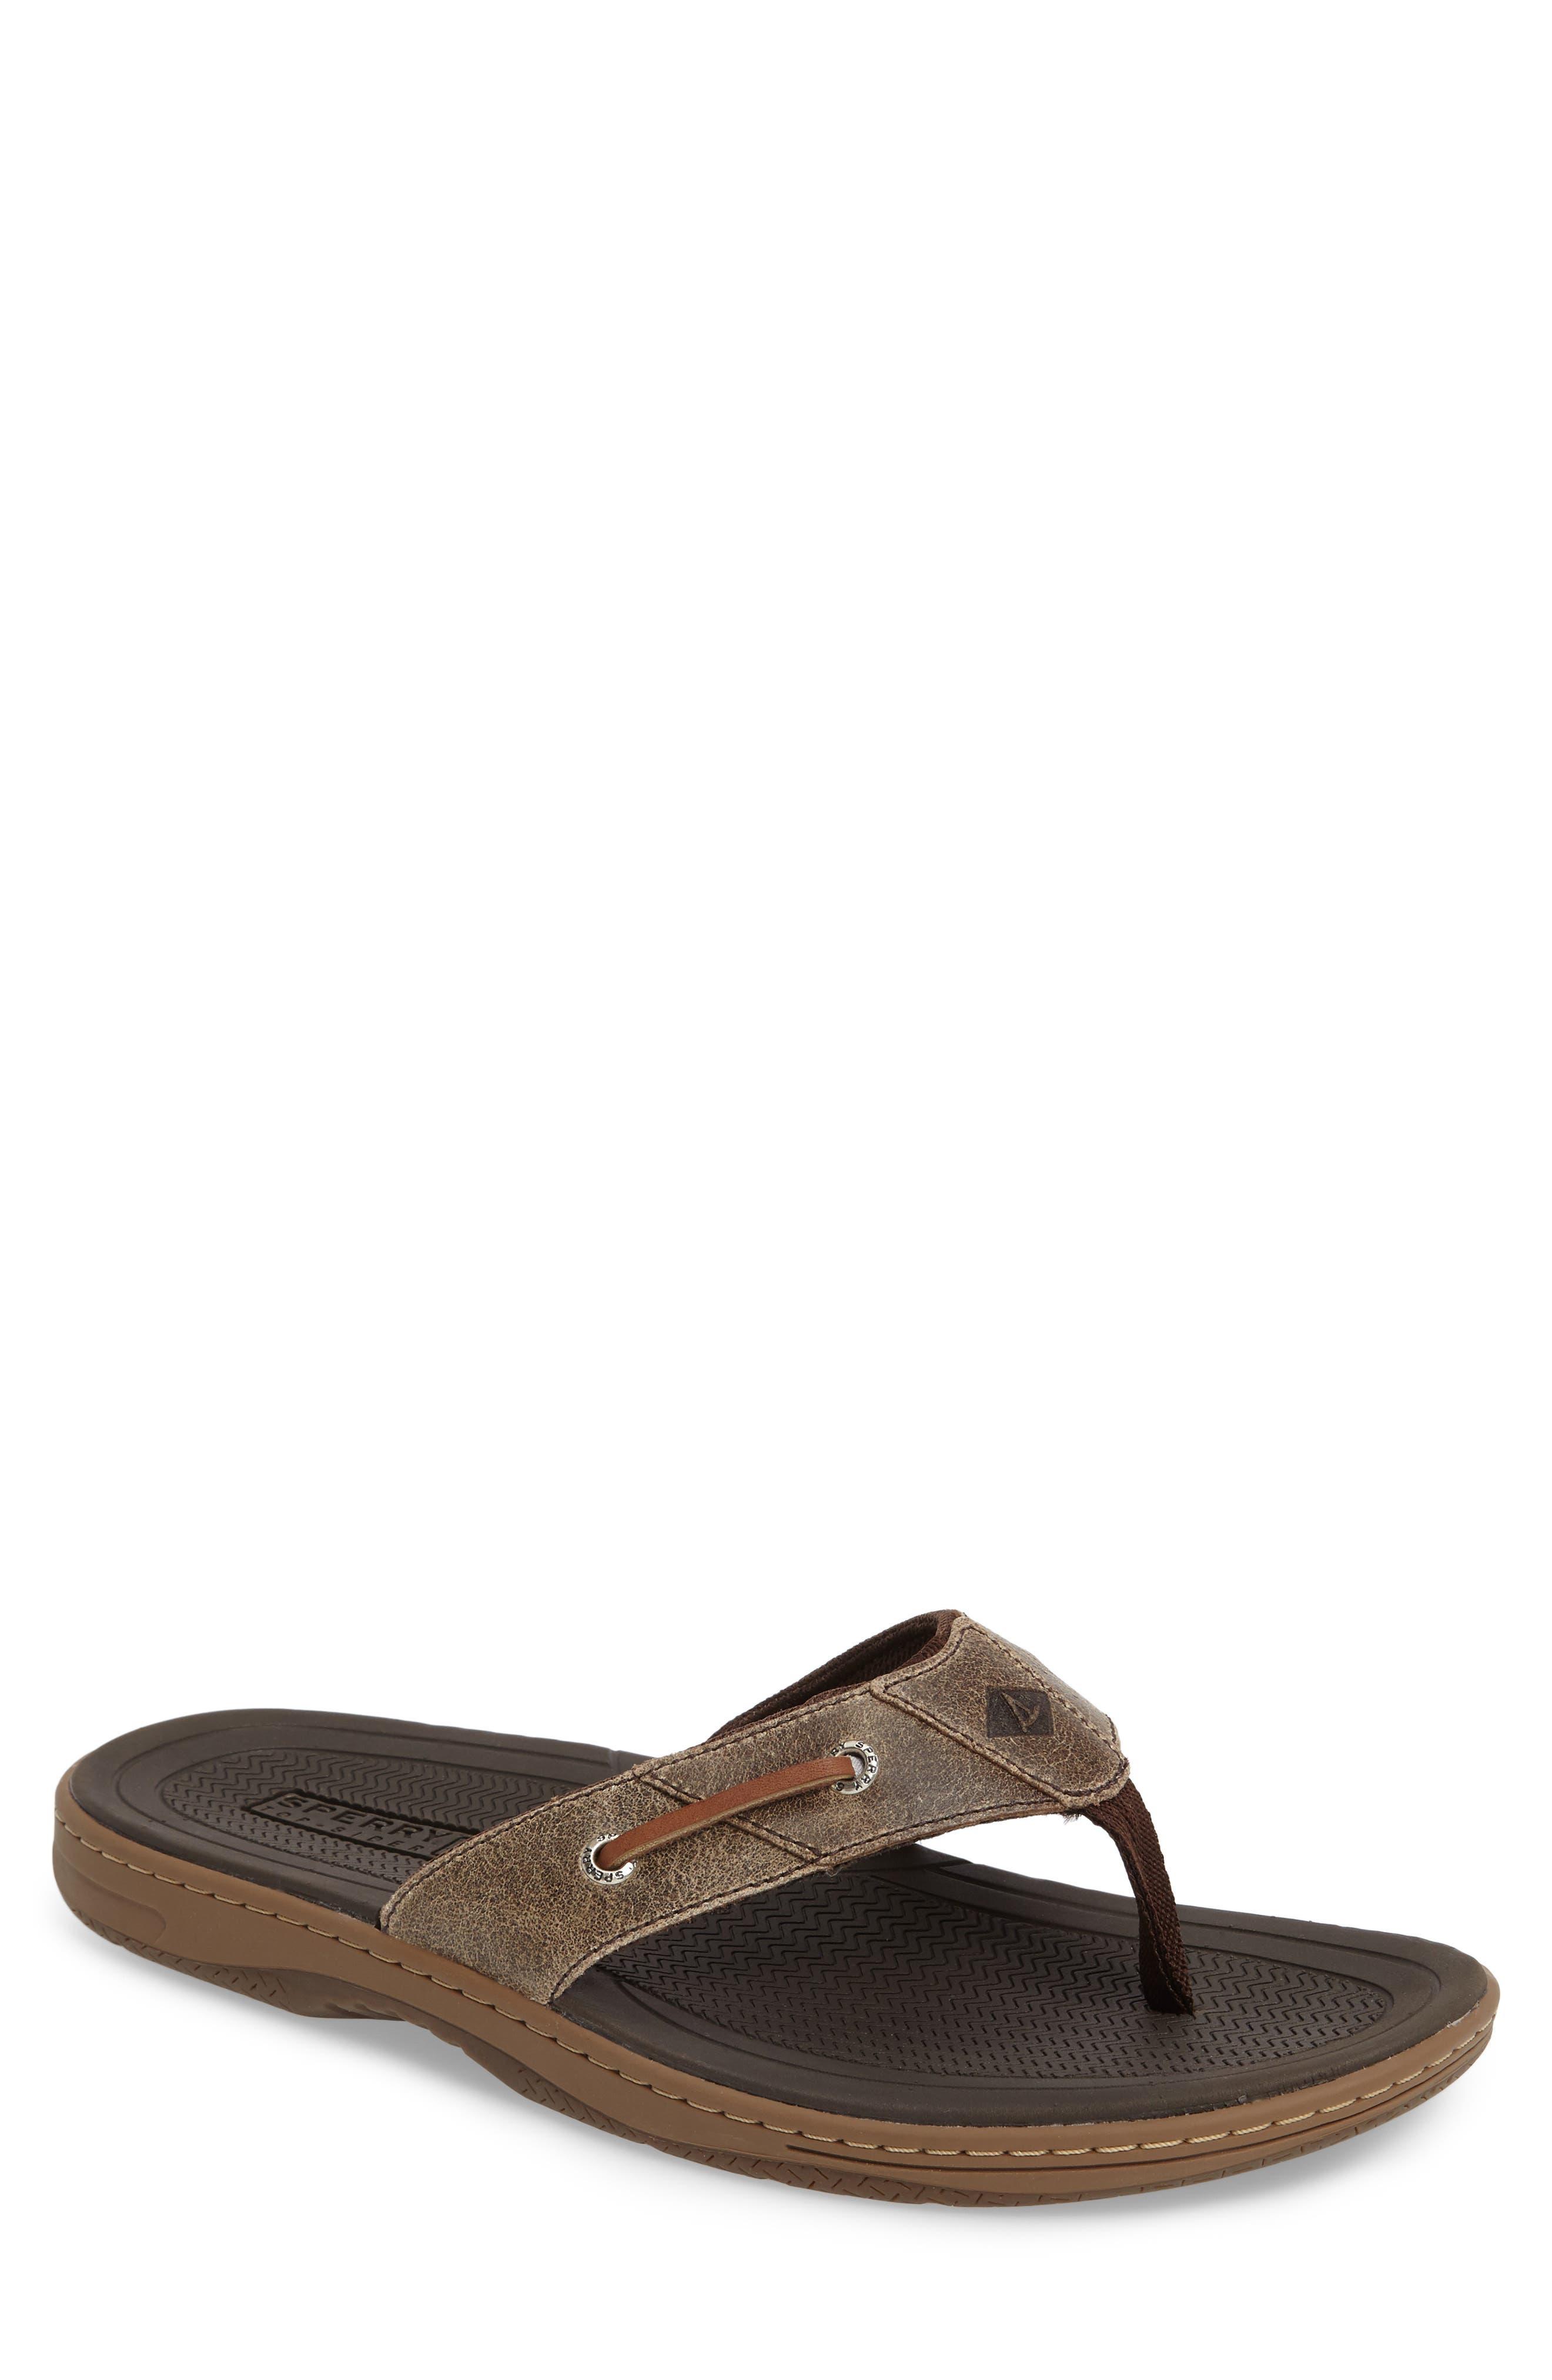 SPERRY 'Baitfish' Sandal, Main, color, BROWN/BROWN